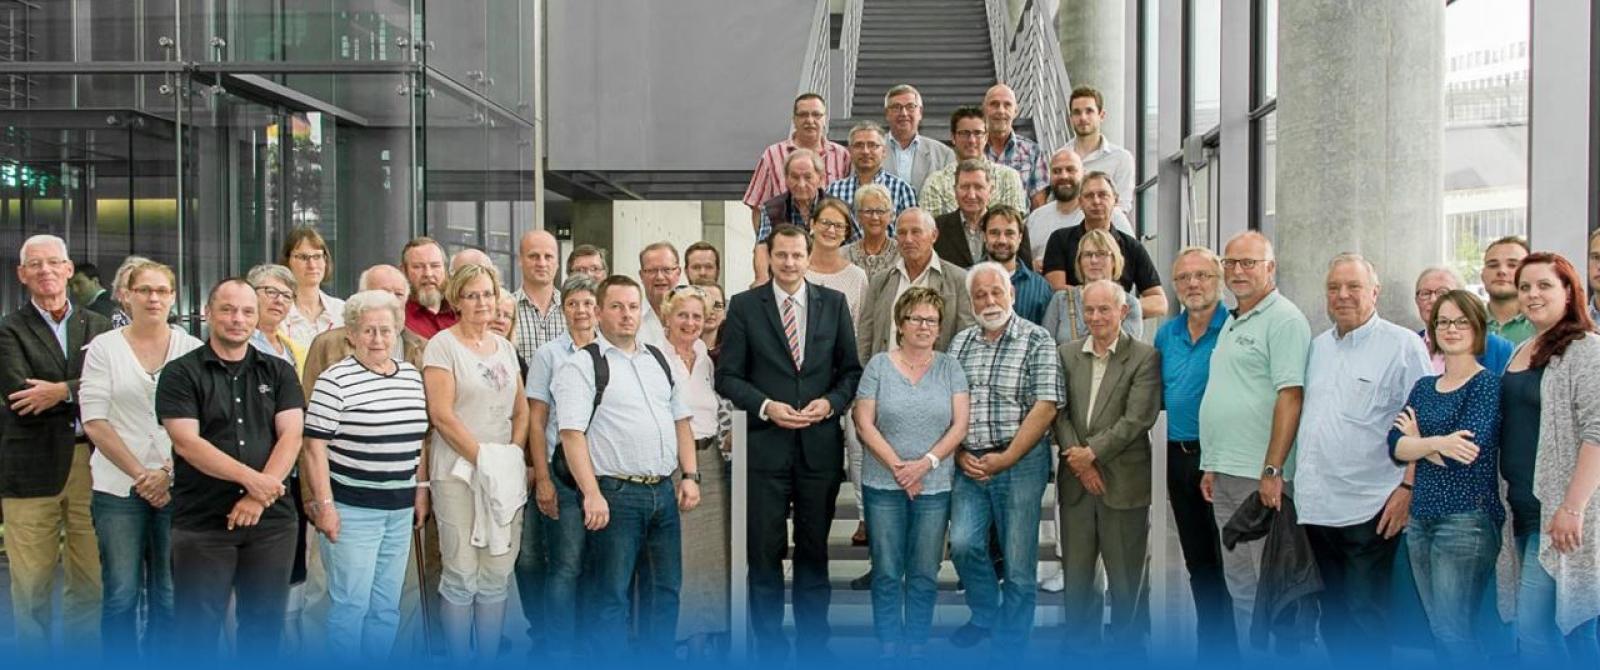 oliver-grundmann-stade-rotenburg-politiker-cdu-berlin-bundestag-mdb (52)